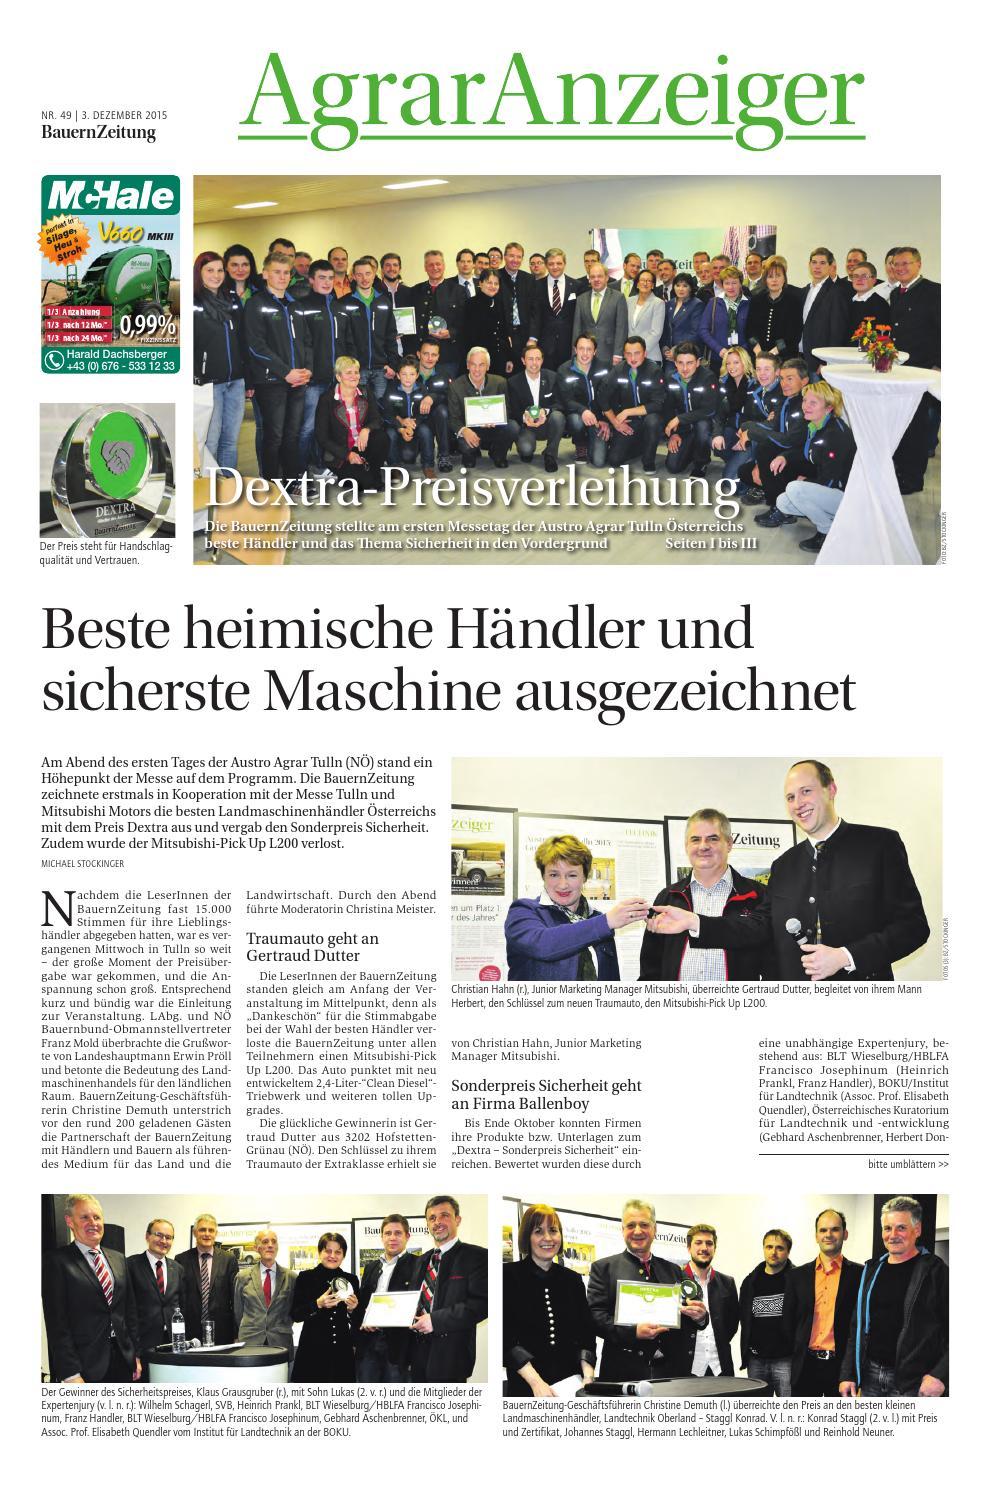 Partnervermittlung Aus Raaba-Grambach Weissach Kontakt